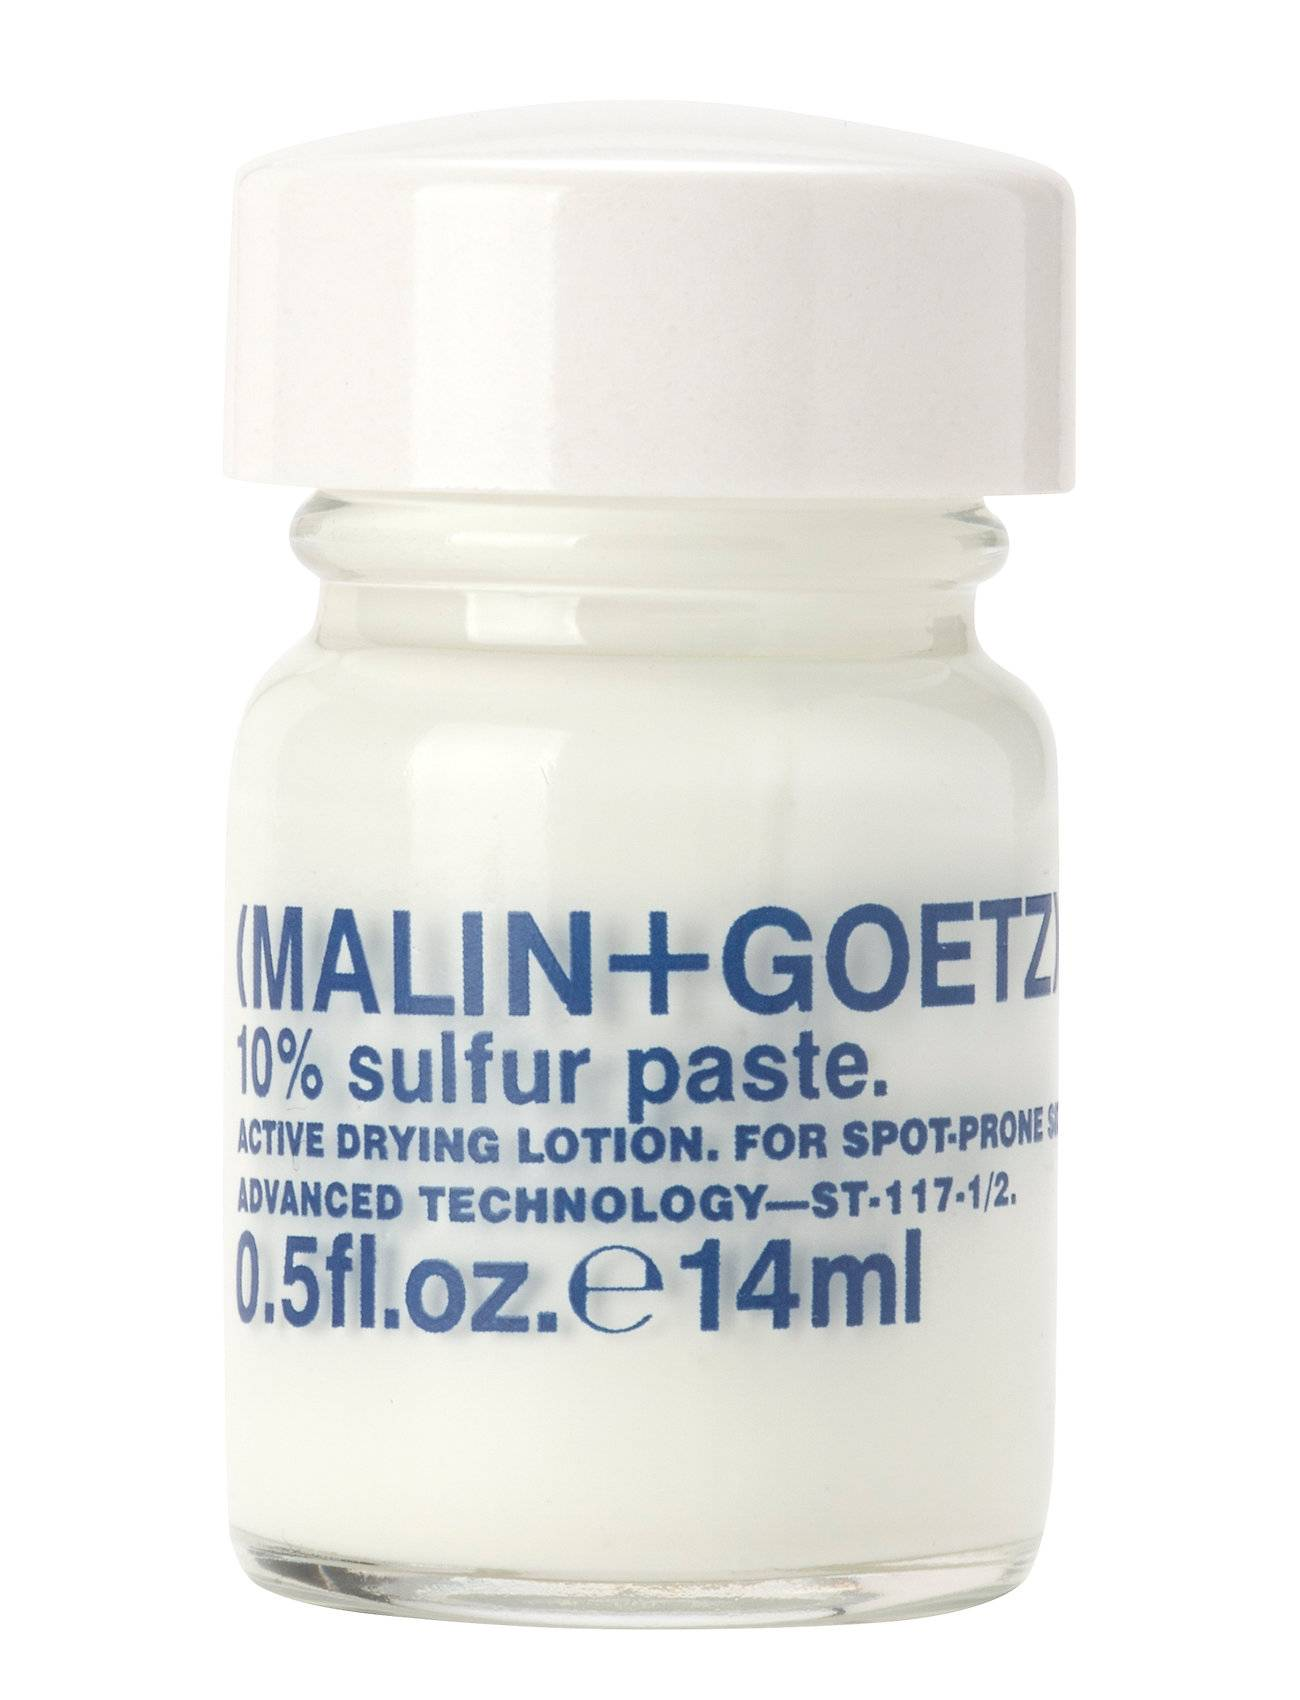 Malin+Goetz 10% Sulfur Past